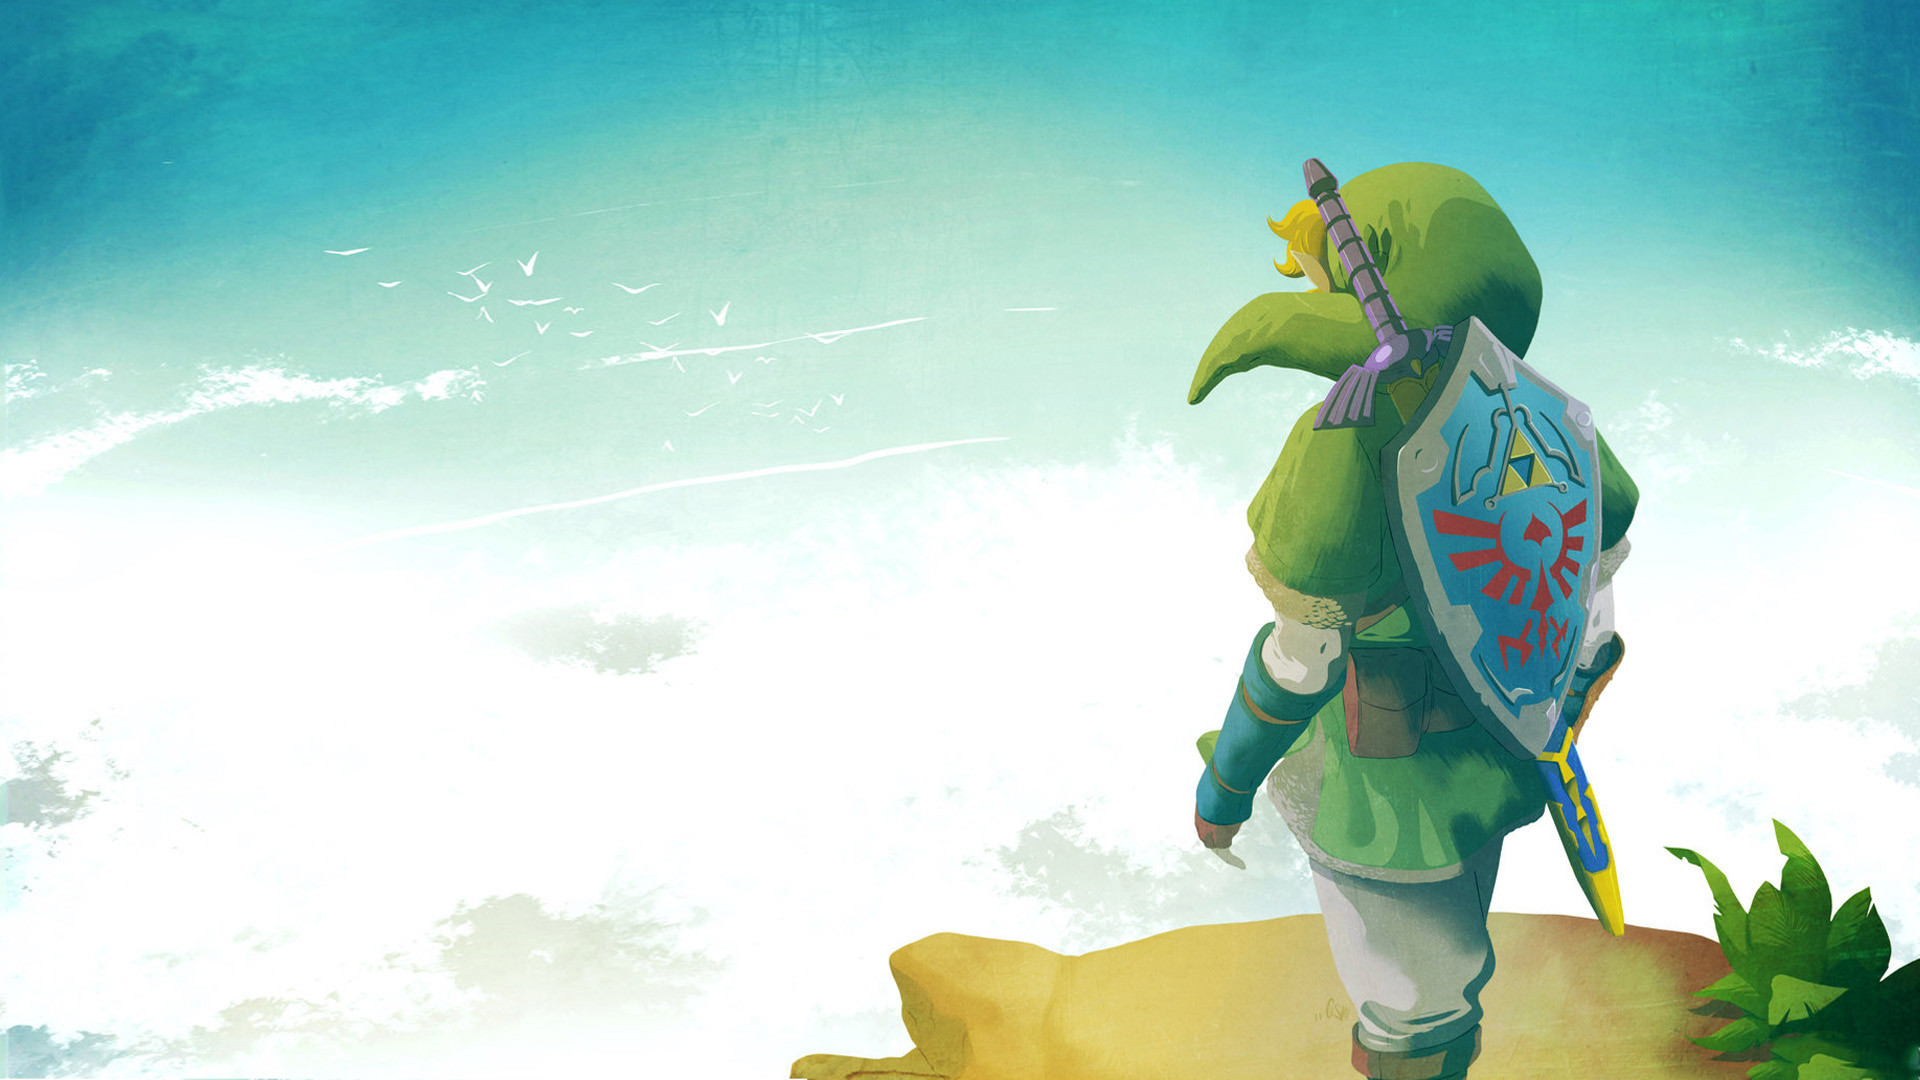 The Legend Of Zelda Skyward Sword Hd Wallpaper Hintergrund